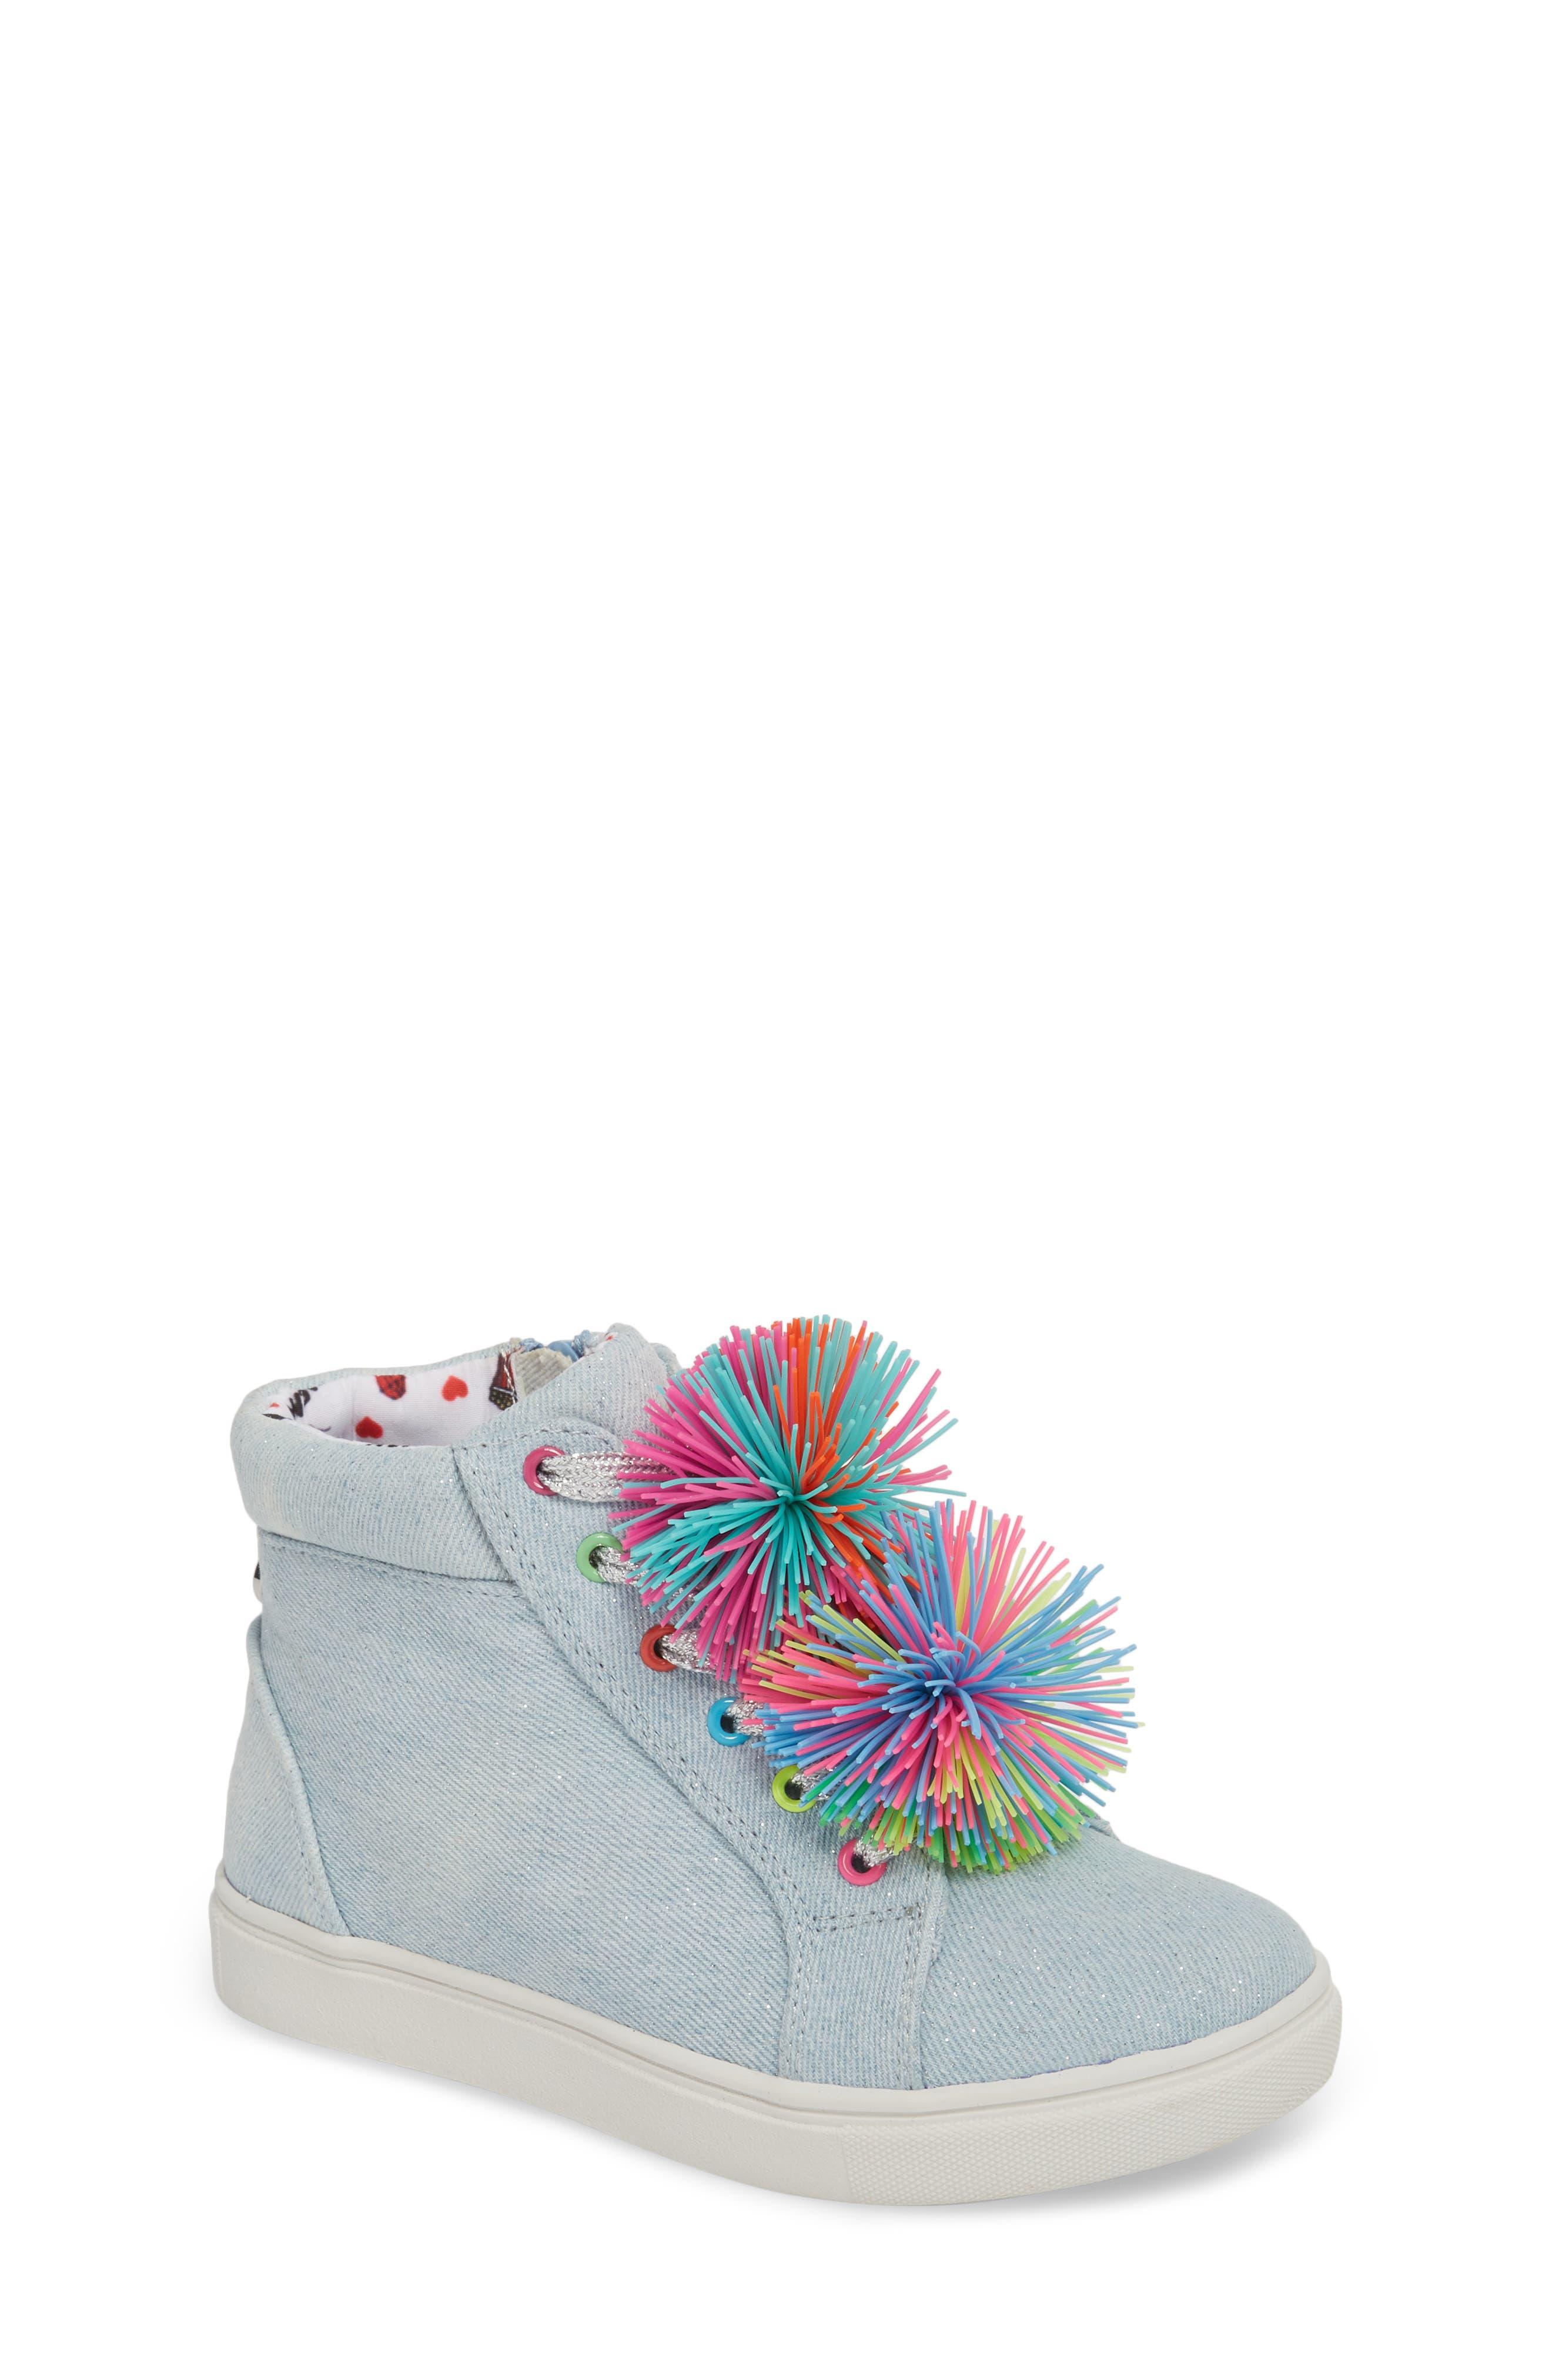 JBrendie Pompom High Top Sneaker,                         Main,                         color, Denim